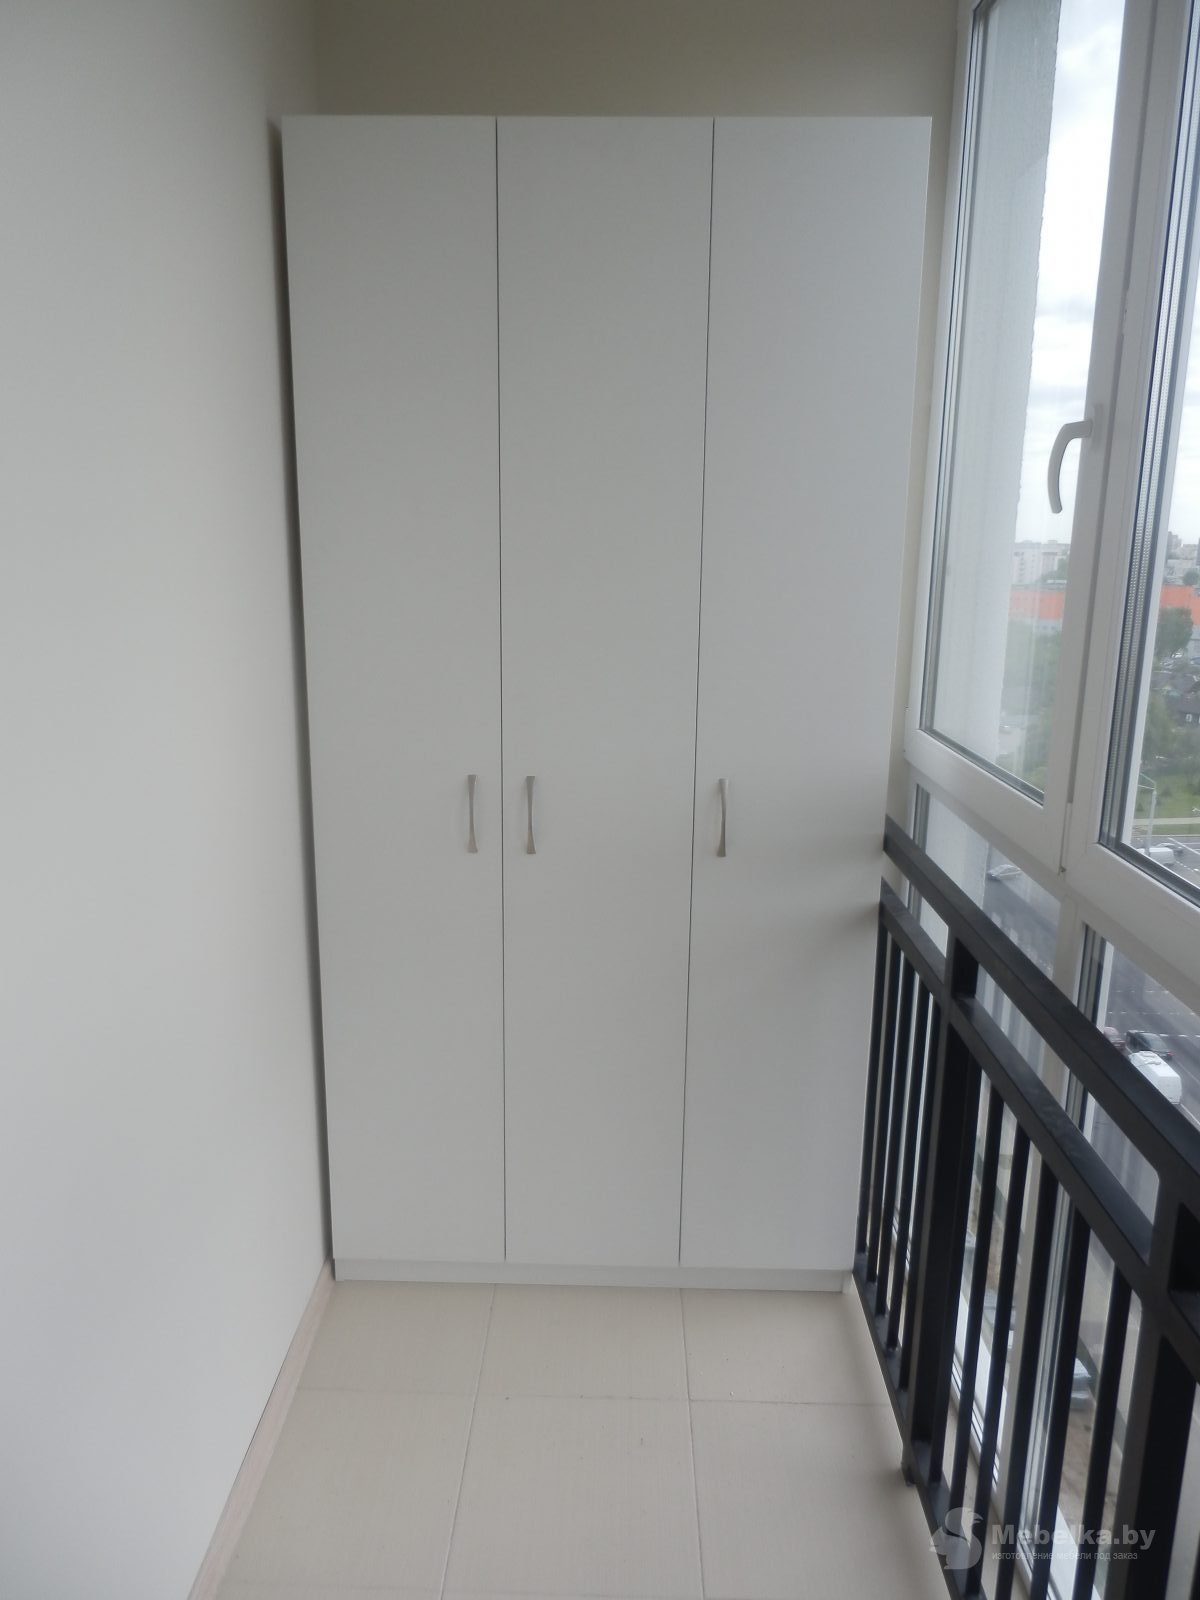 Корпусный шкаф на балконе